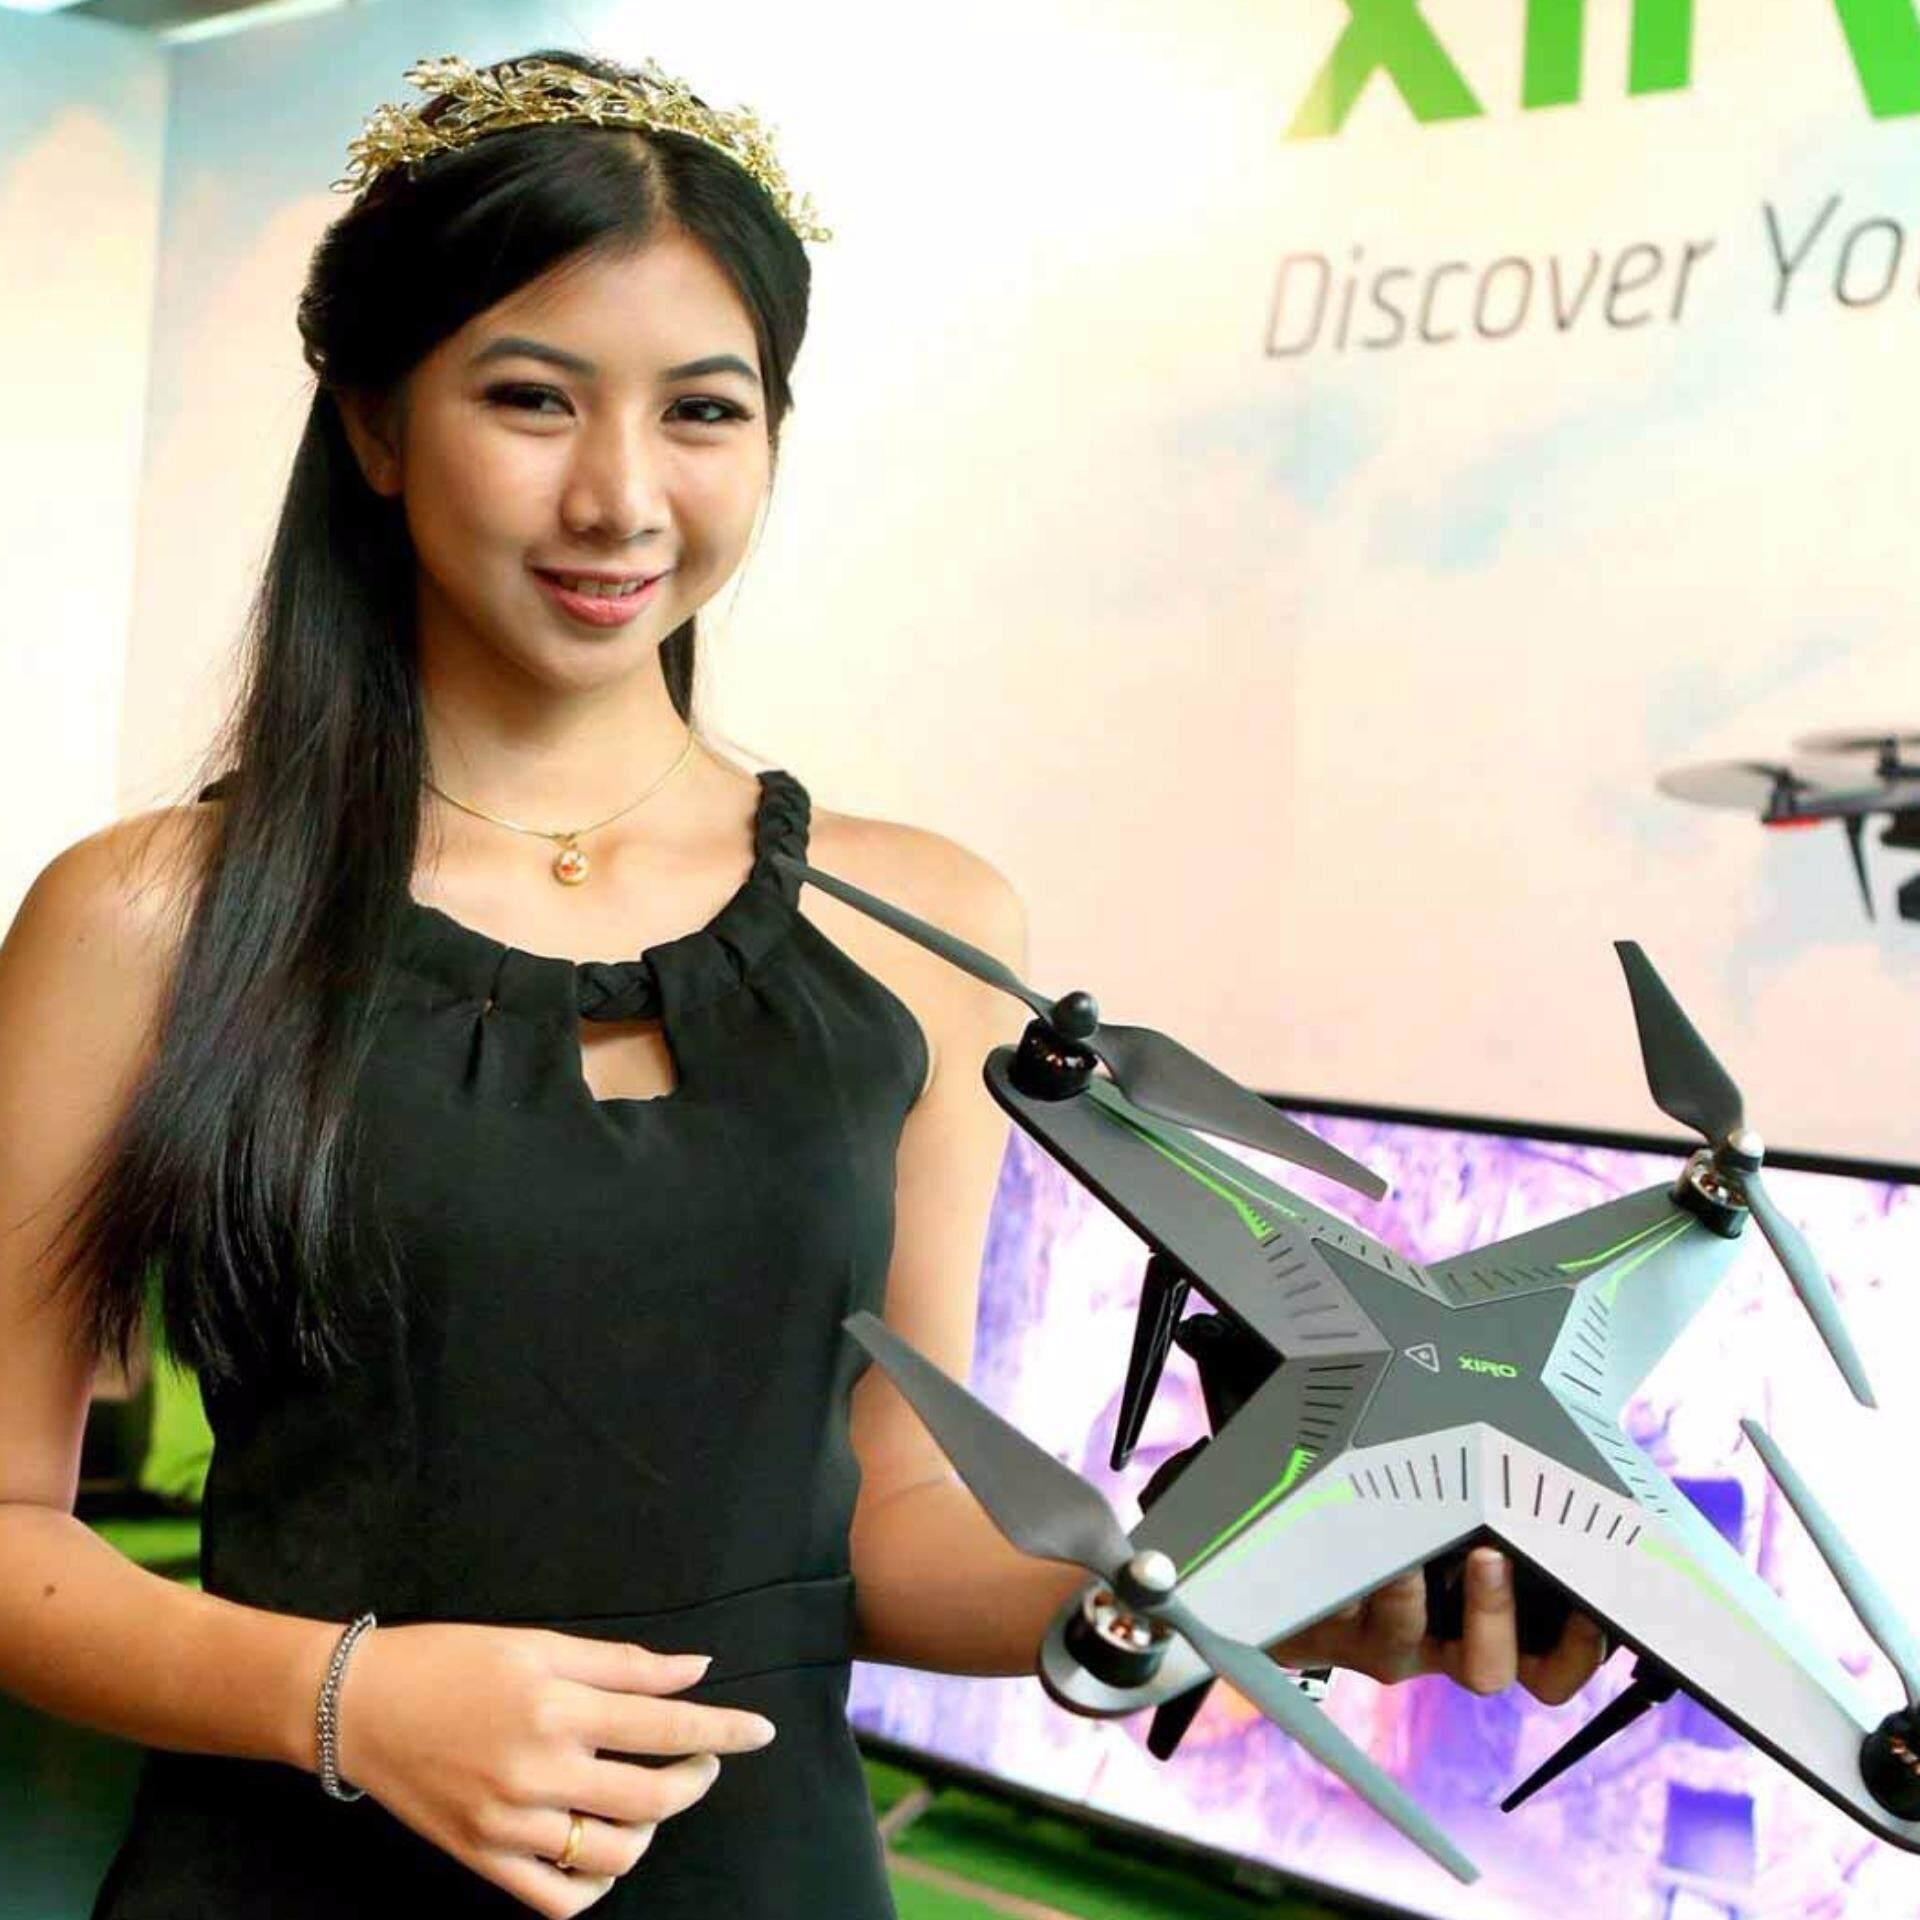 XIRO Zero Xplorer V โดรนติดกล้องความละเอียดสูง Full HD 14 ล้าน